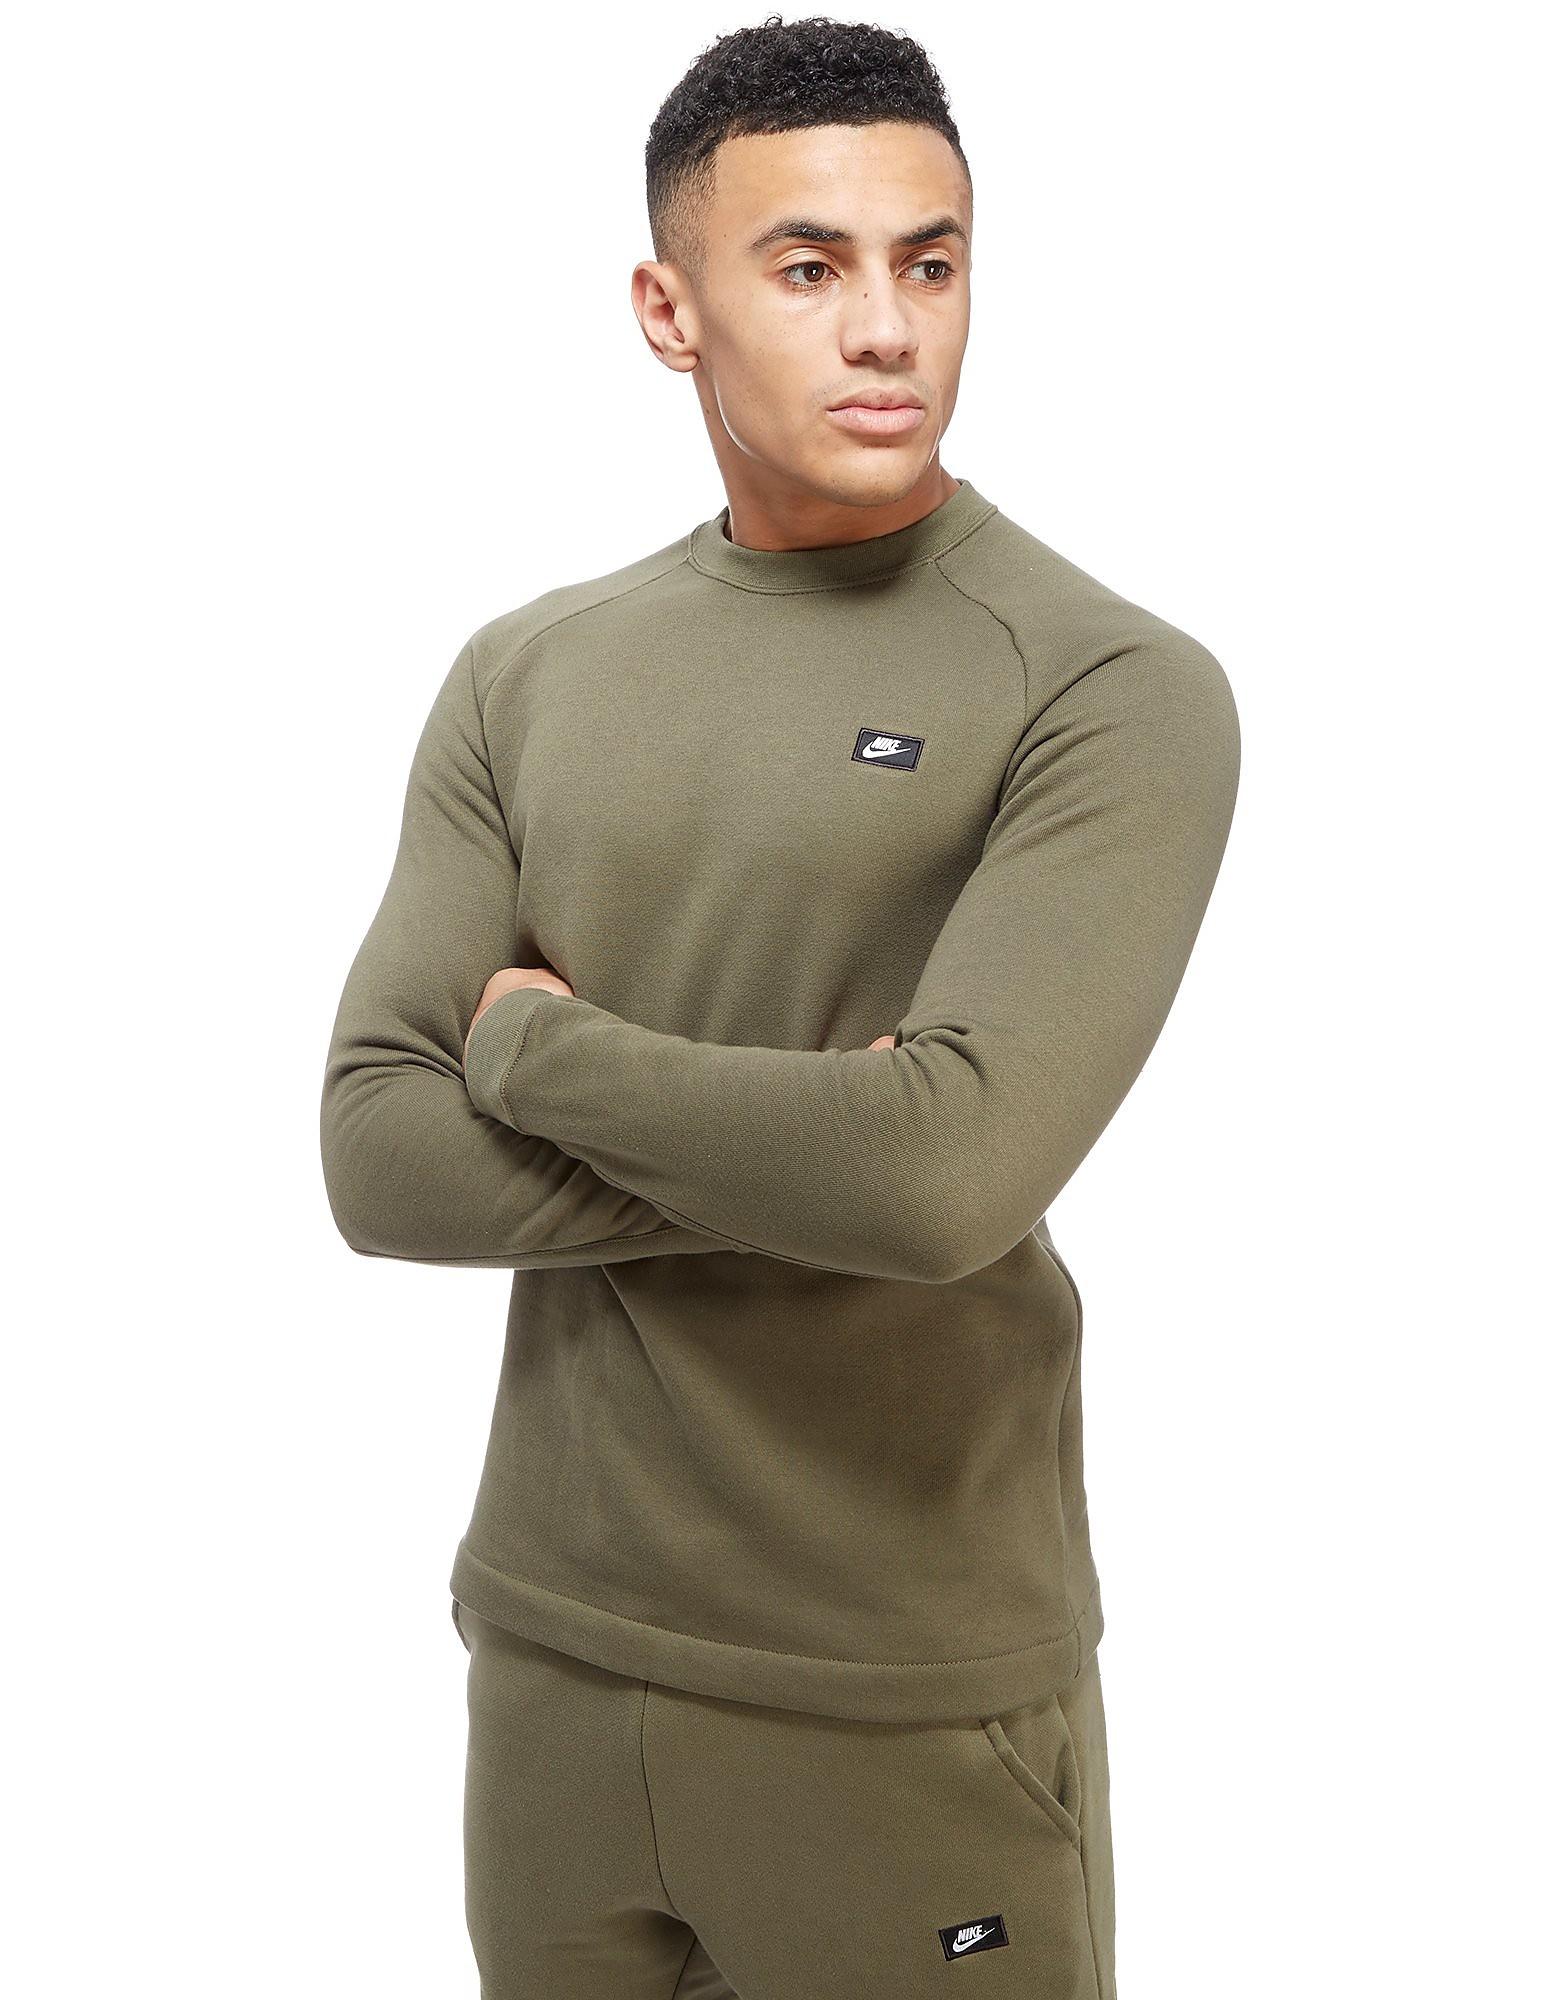 Nike Modern Crew Sweatshirt - Olive, Olive